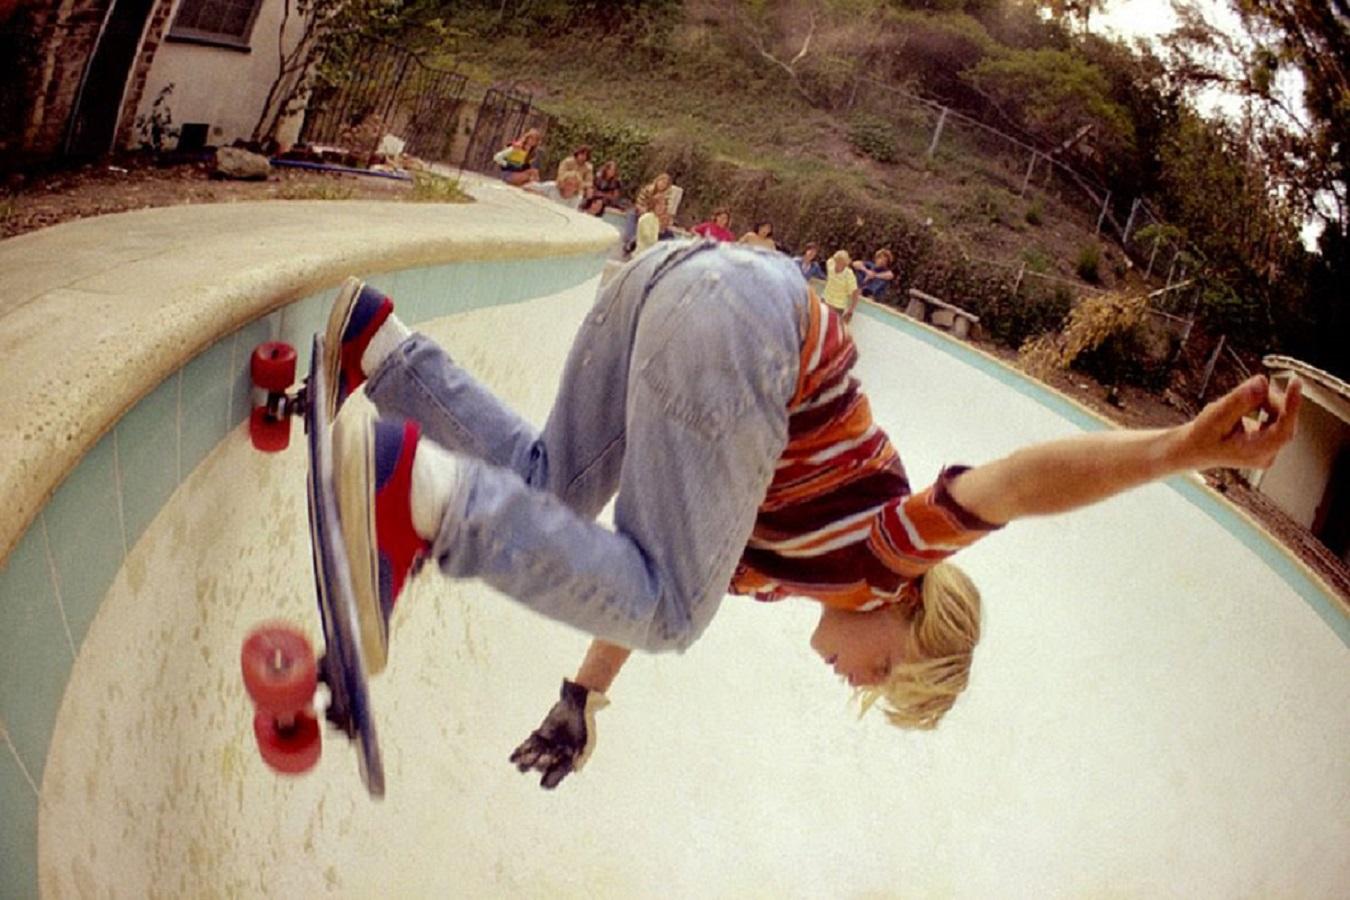 1970-California-skateboard-skater-kids-locals-only-hugh-holland-34